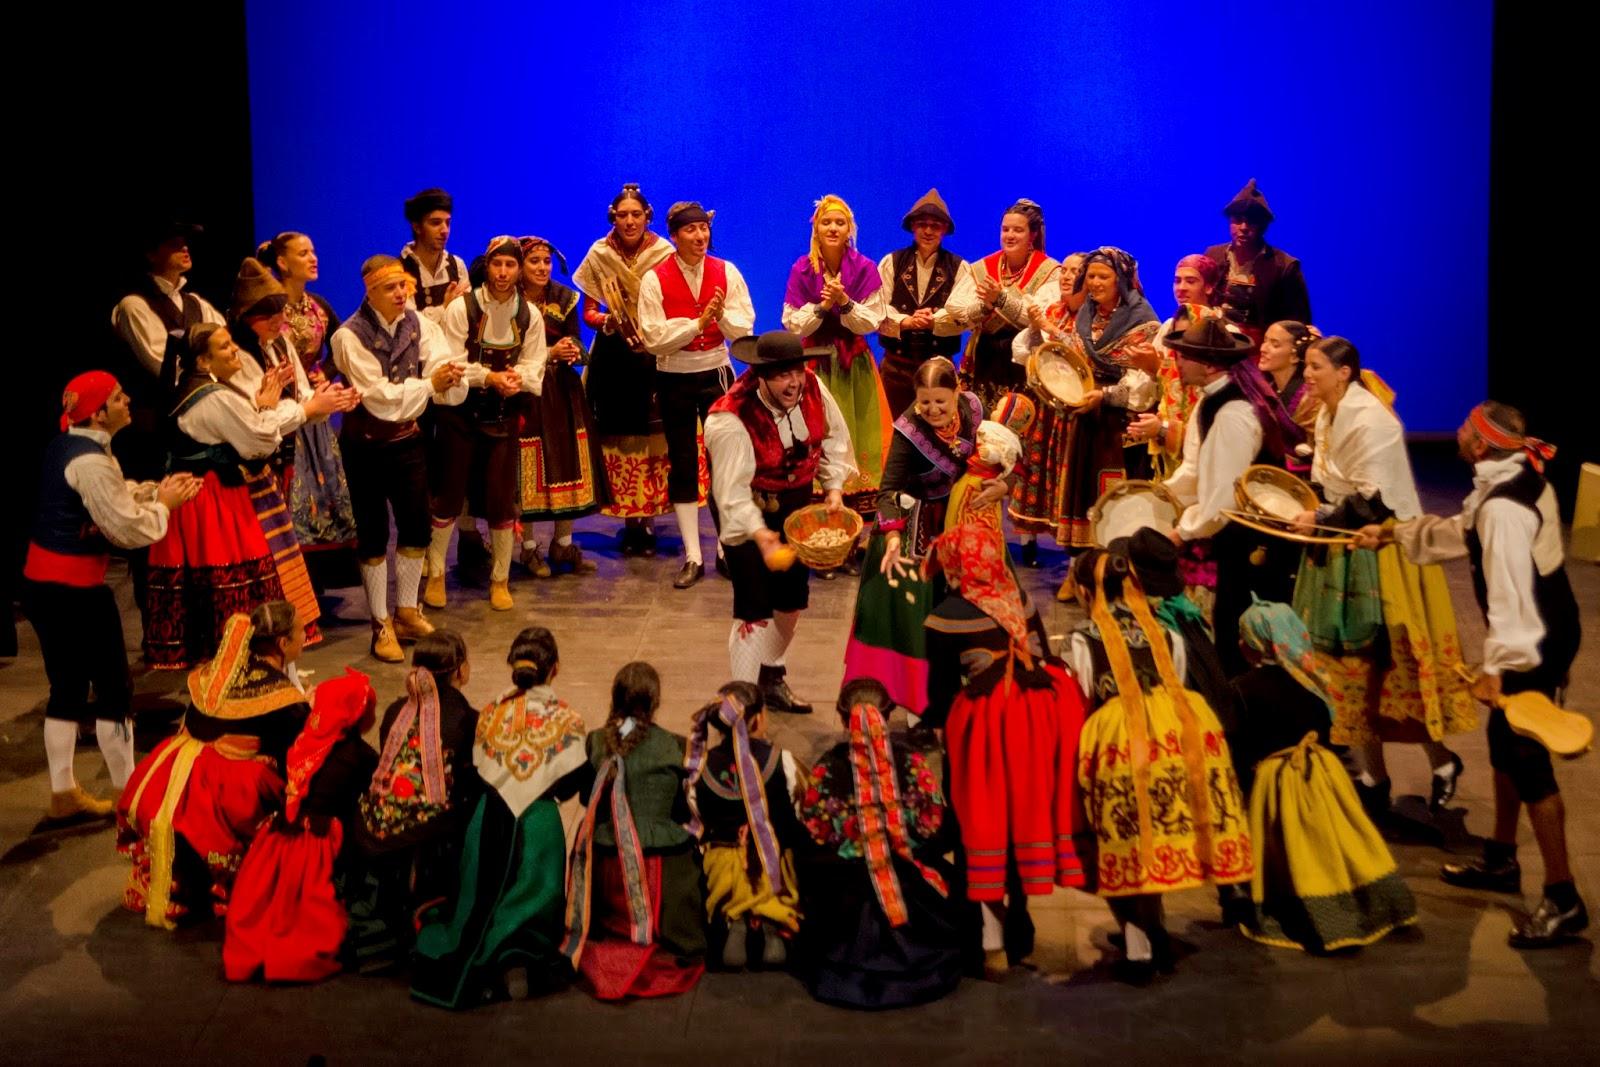 DON SANCHO. Difusión de la Cultura Tradicional de Zamora ... - photo#46